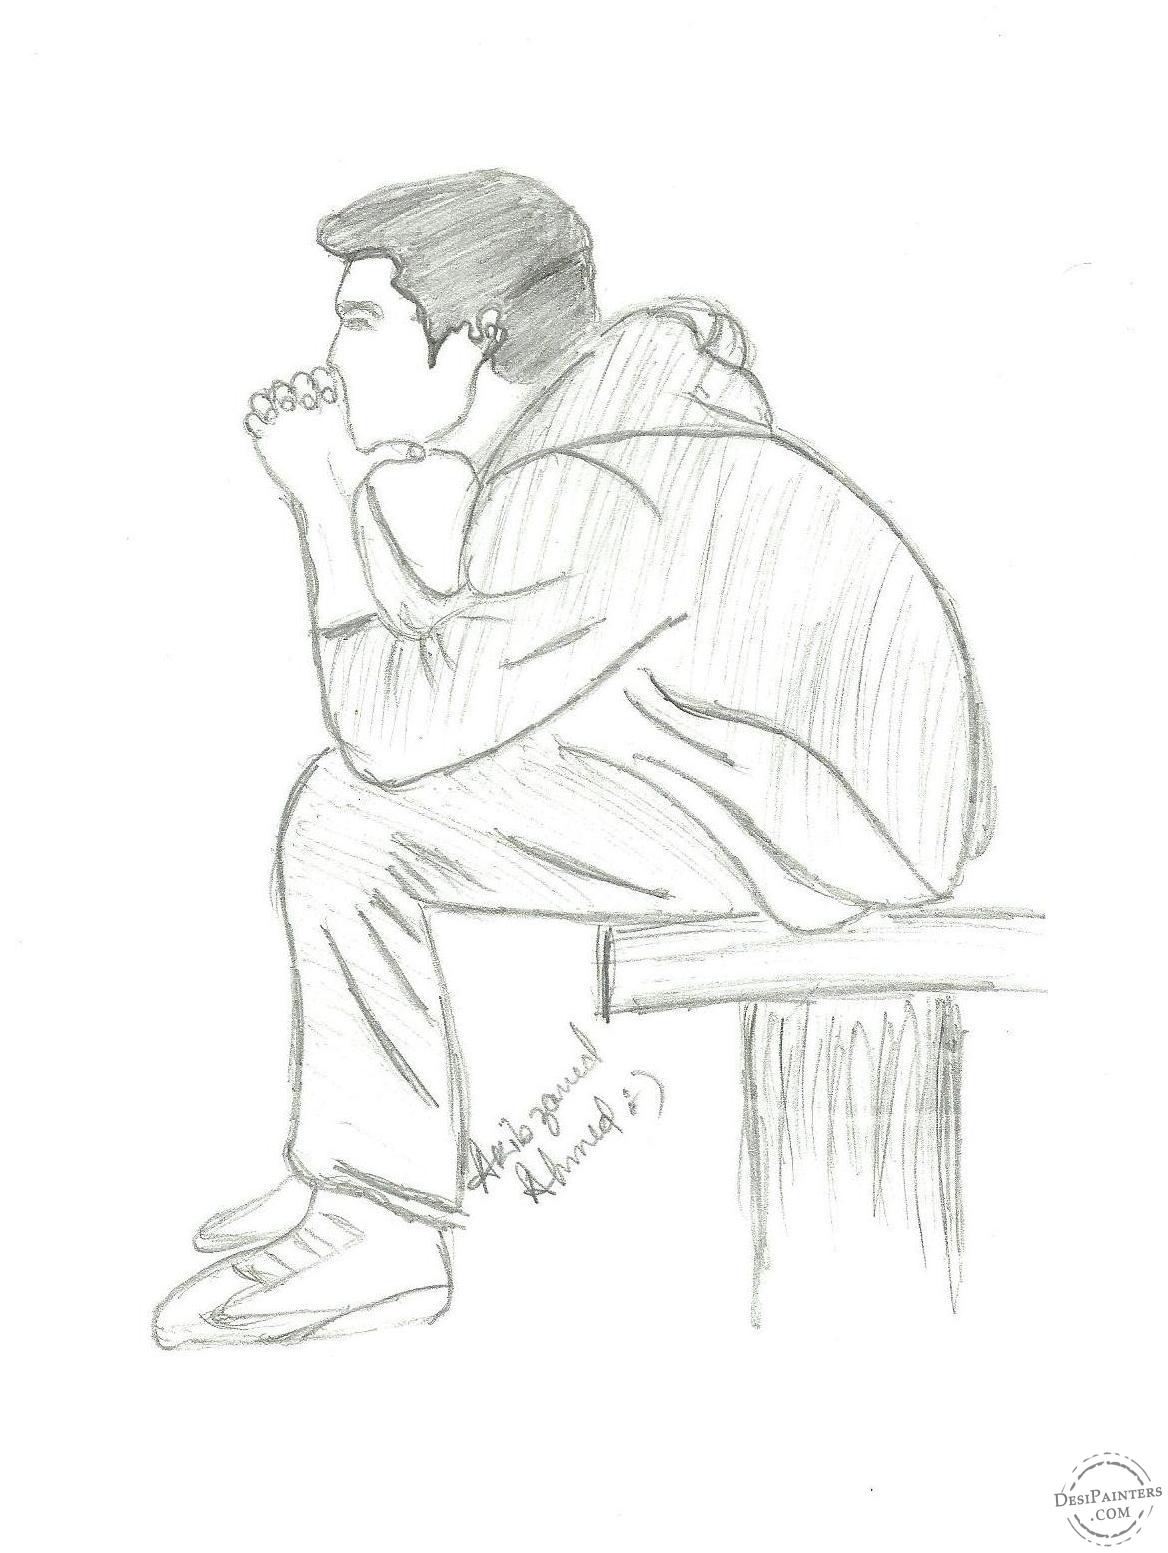 1168x1553 Sketches Of Alone Boy Alone Boy In The Rain Pencil Sketch Sad